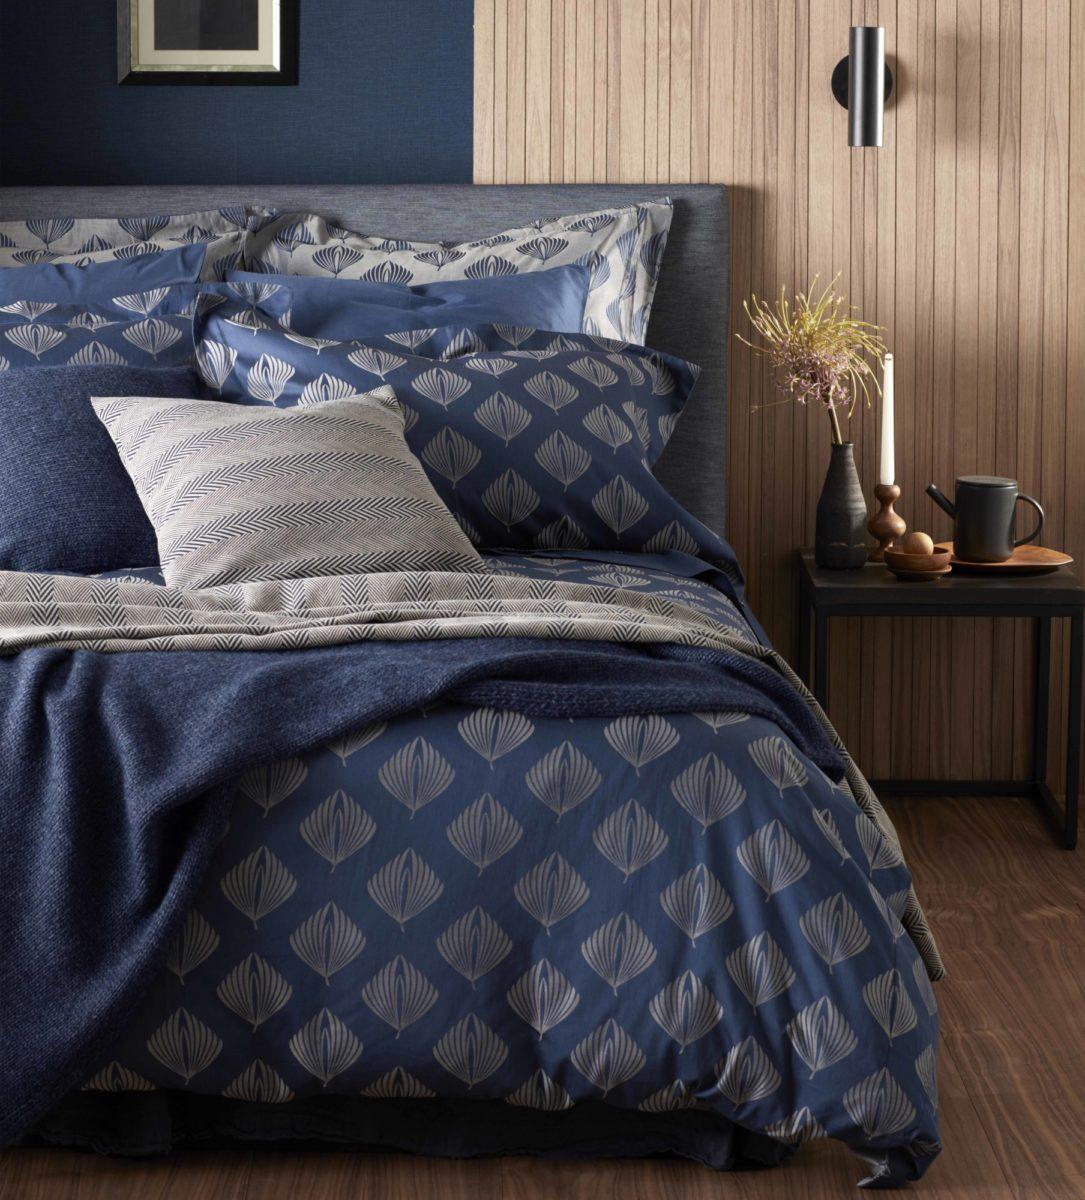 Pinecones Midnight Blue Cotton Bedding Secret Linen Store